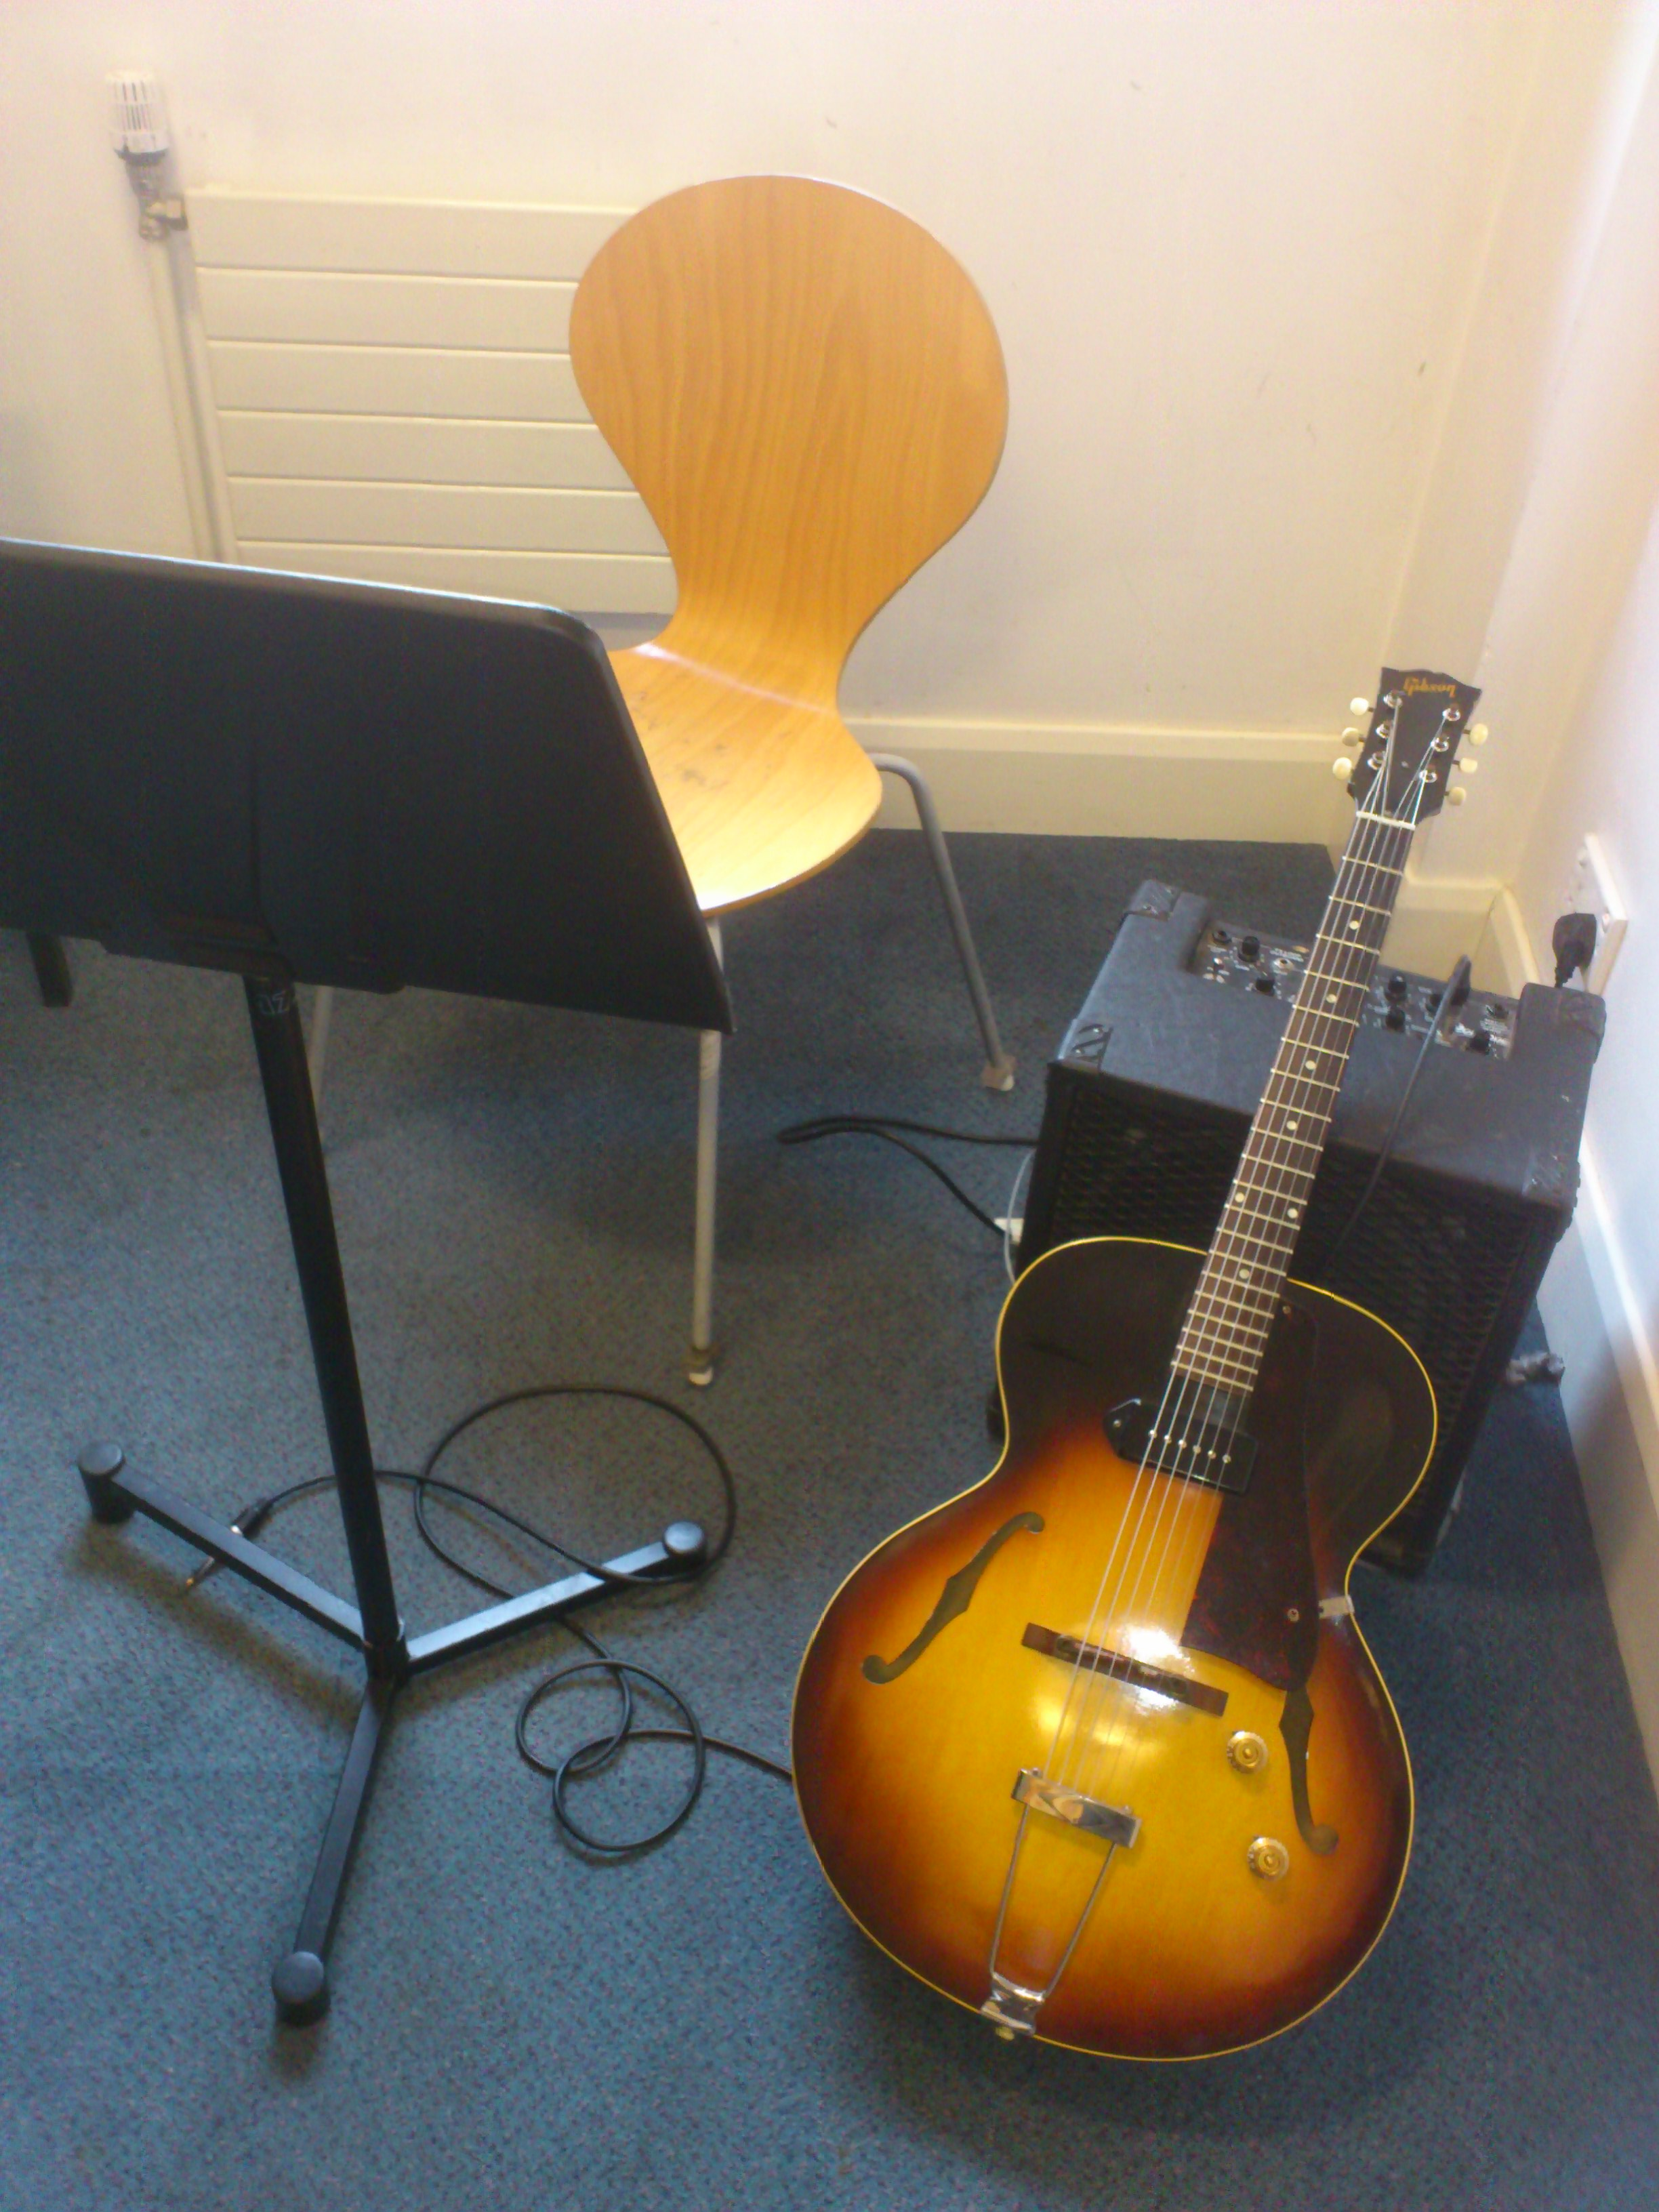 Jazz guitar practice routine